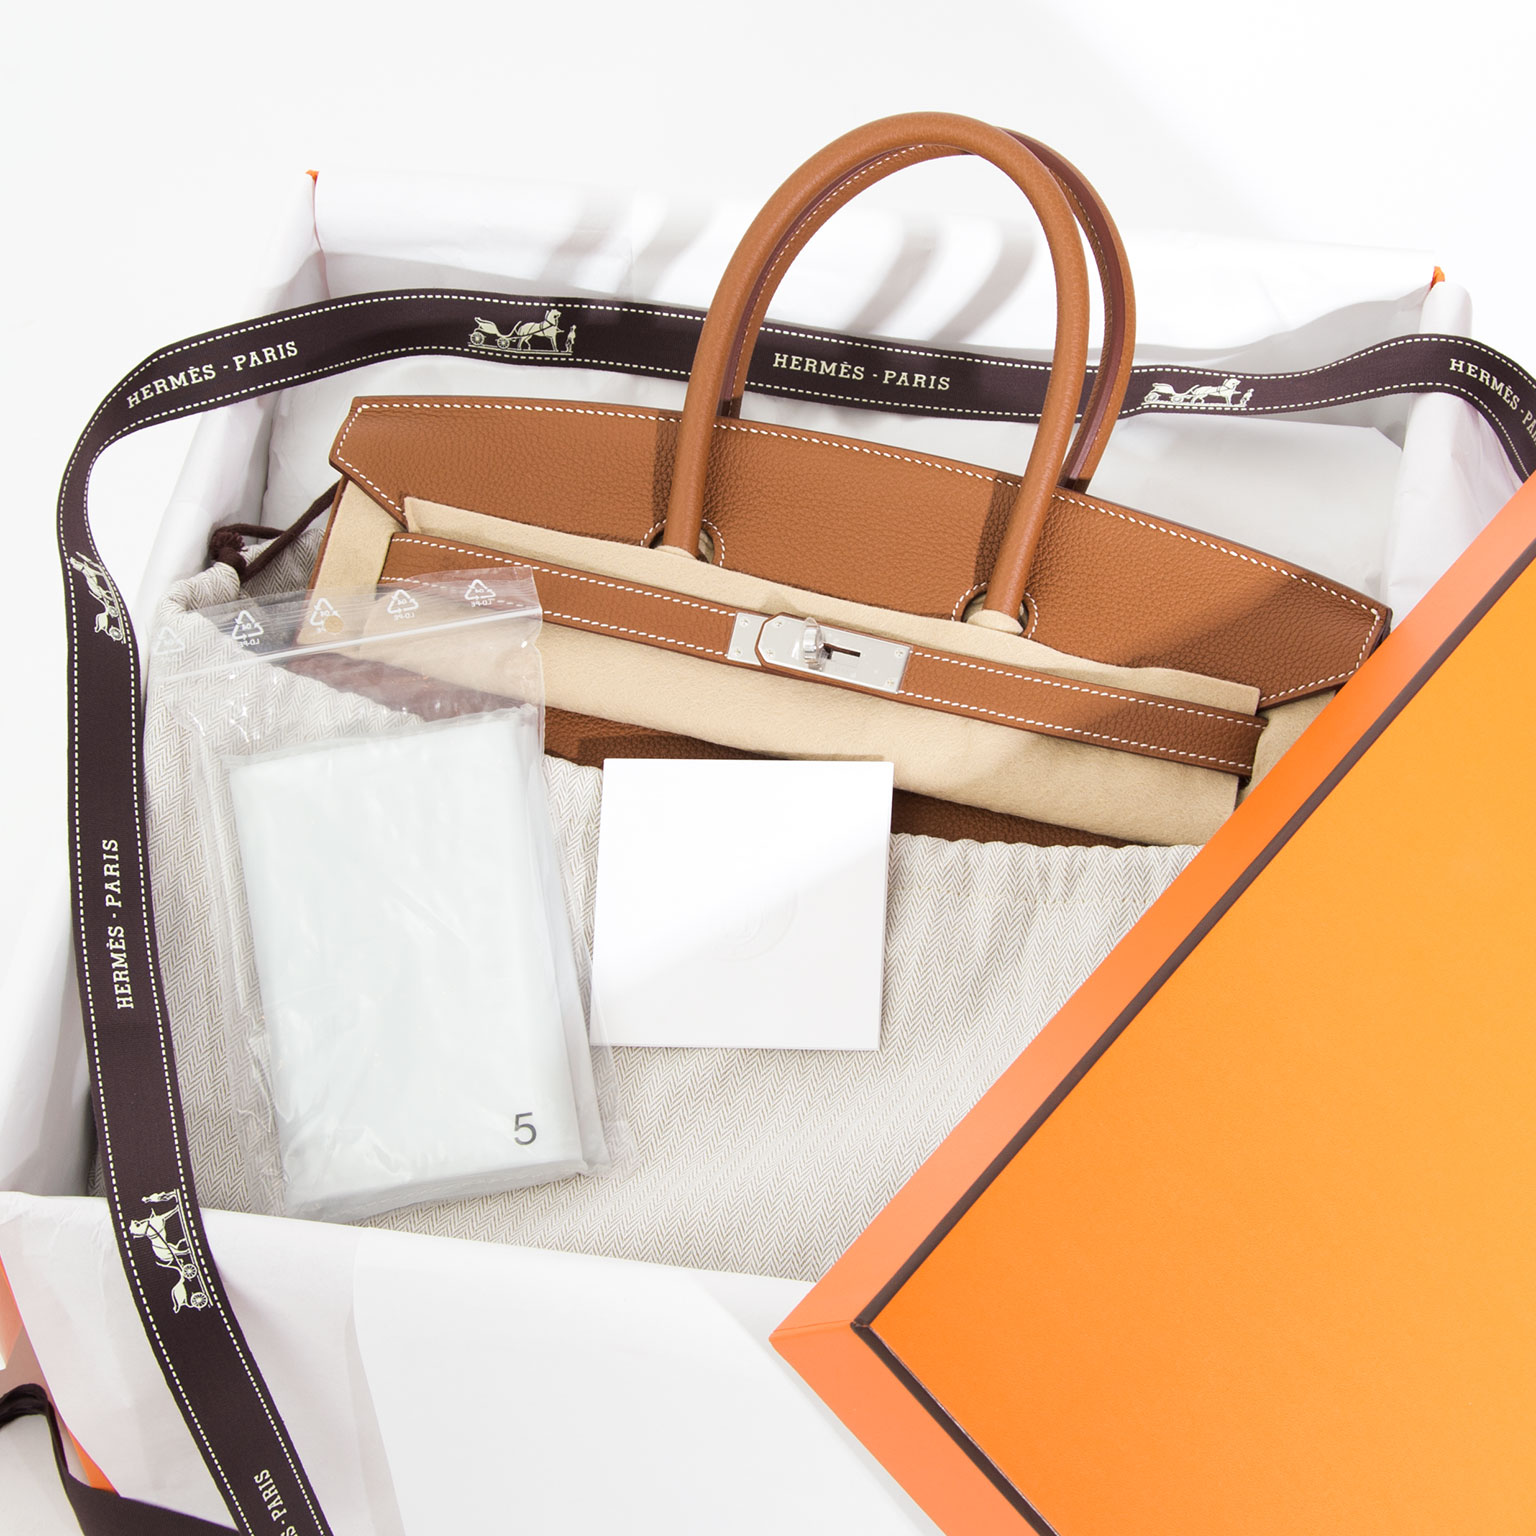 d8ff3da4926b Koop veilig onine BRAND NEW Hermès Birkin Bag 35 PHW Togo Gold Worldwide  shipping. Koop veilig onine tweedehands